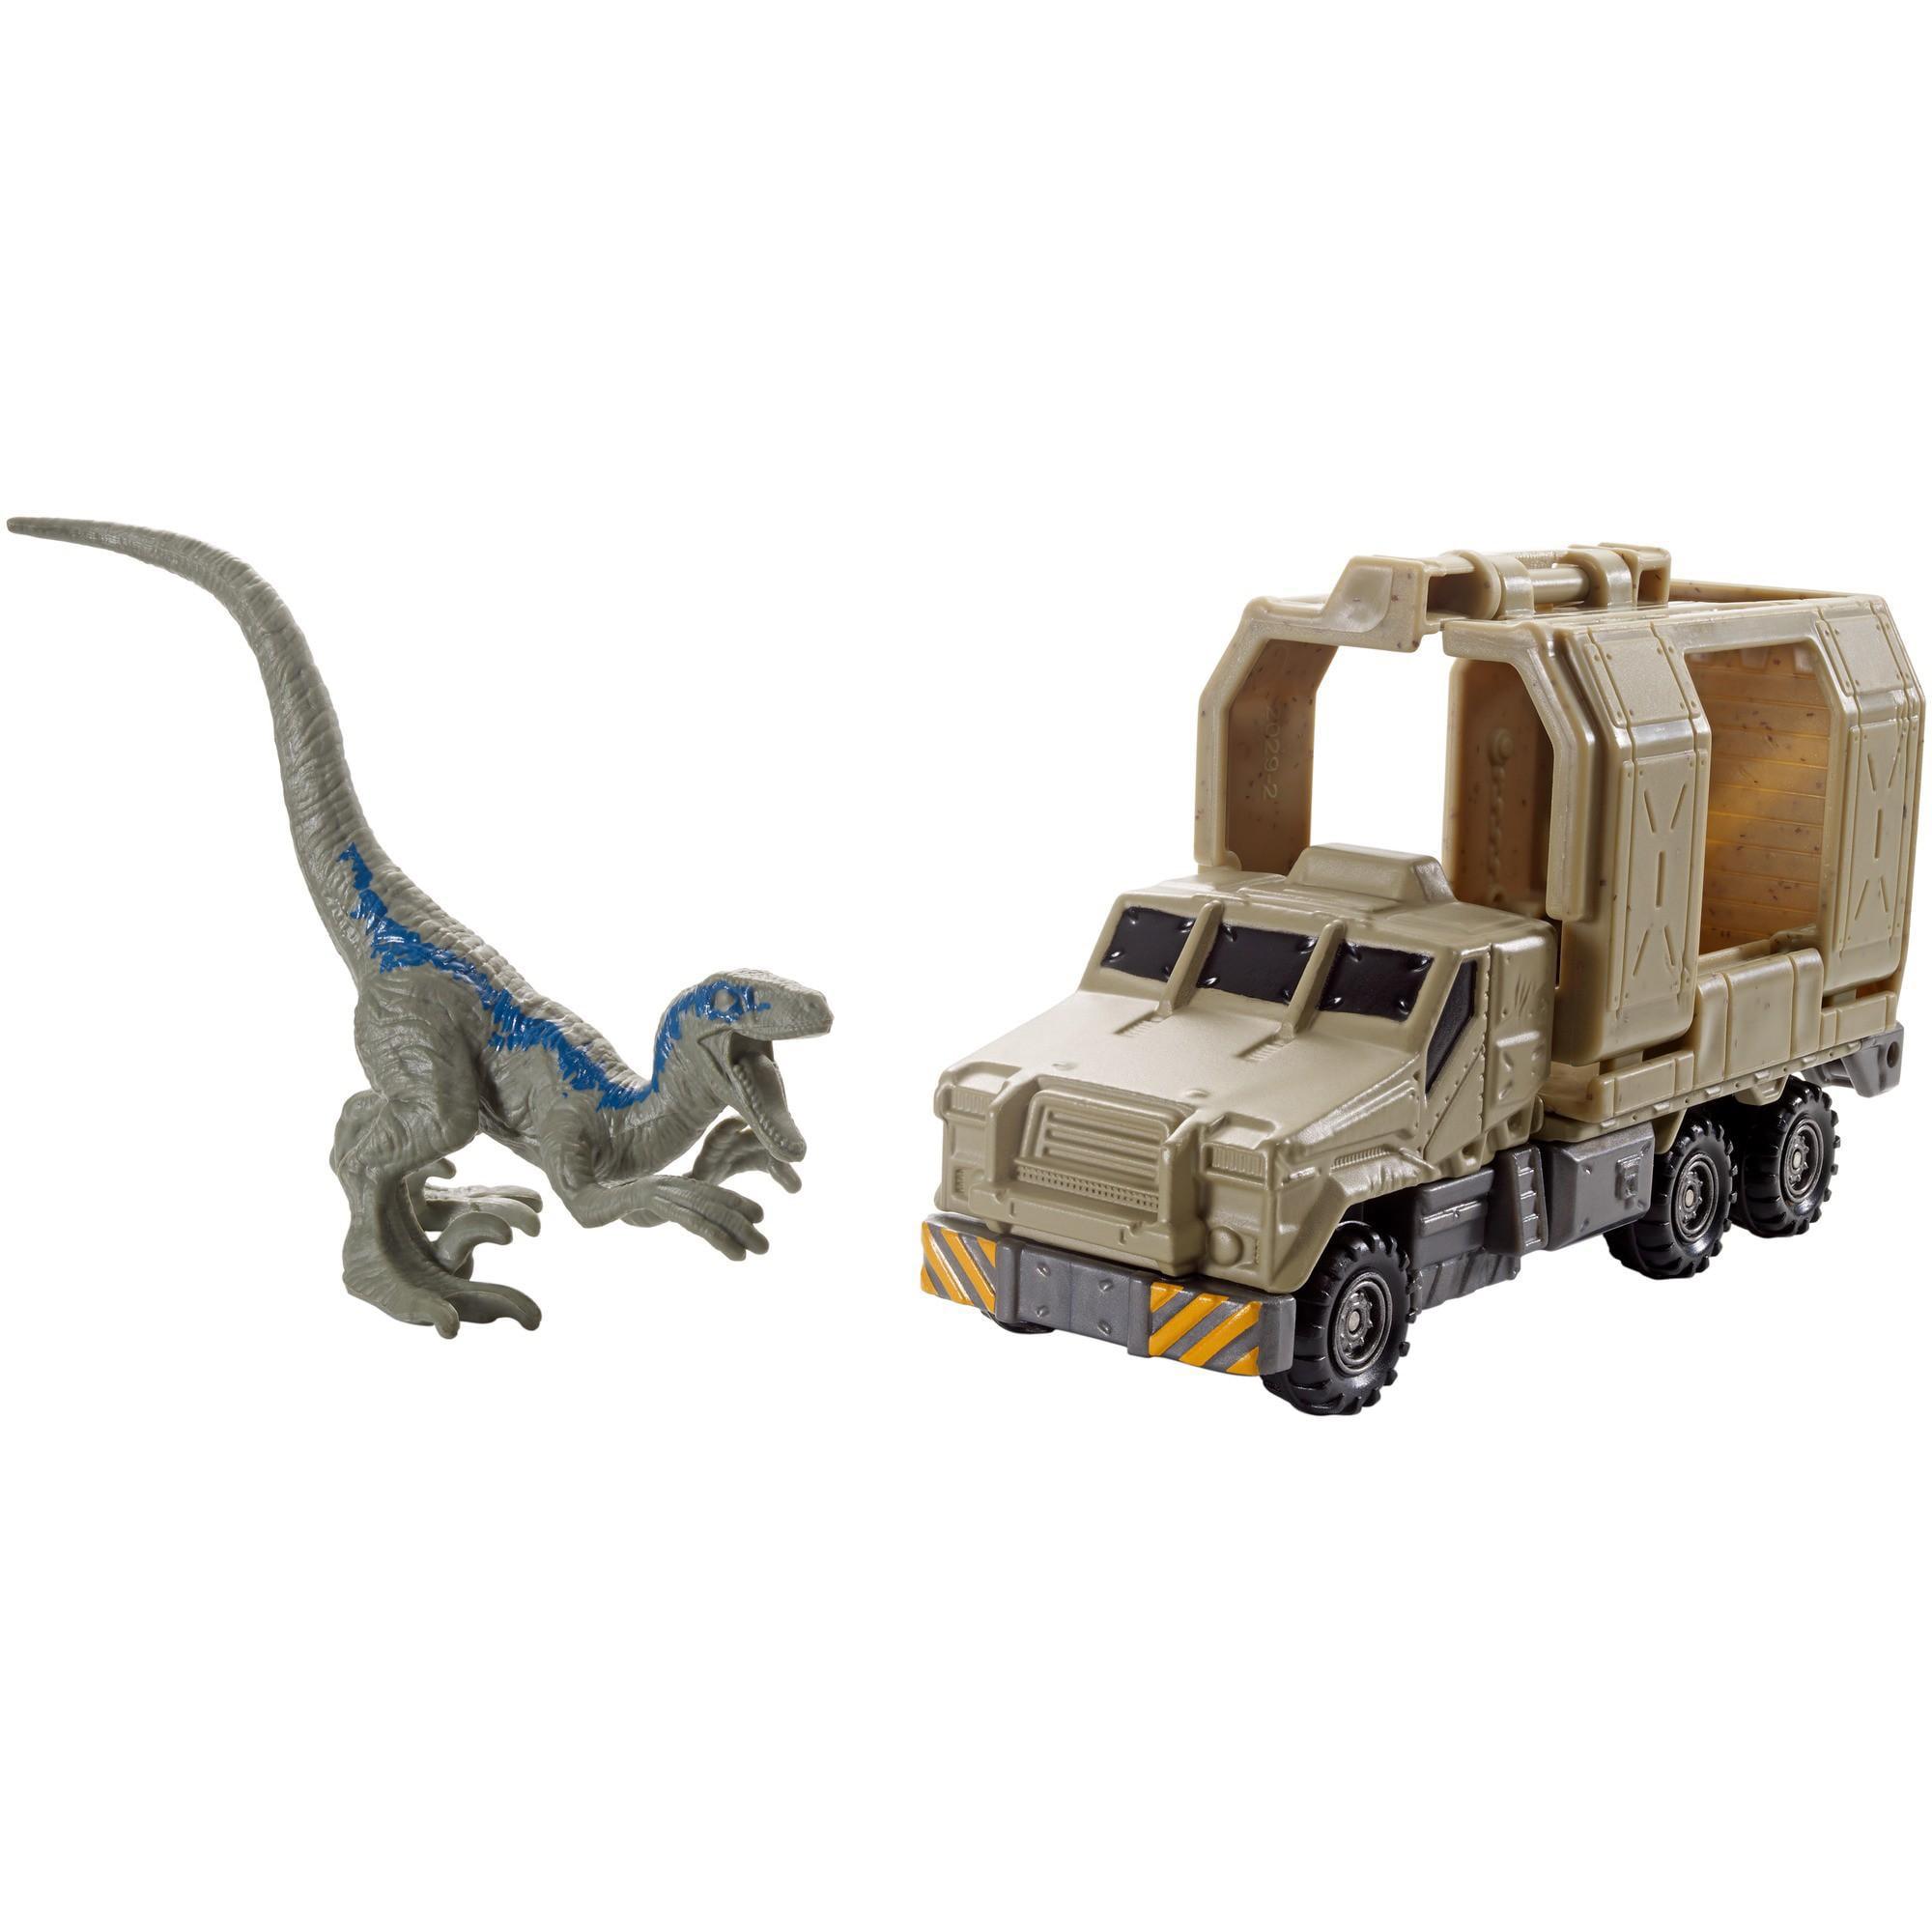 Matchbox Jurassic World Dino Transporters Armored Raptor Hauler by Mattel